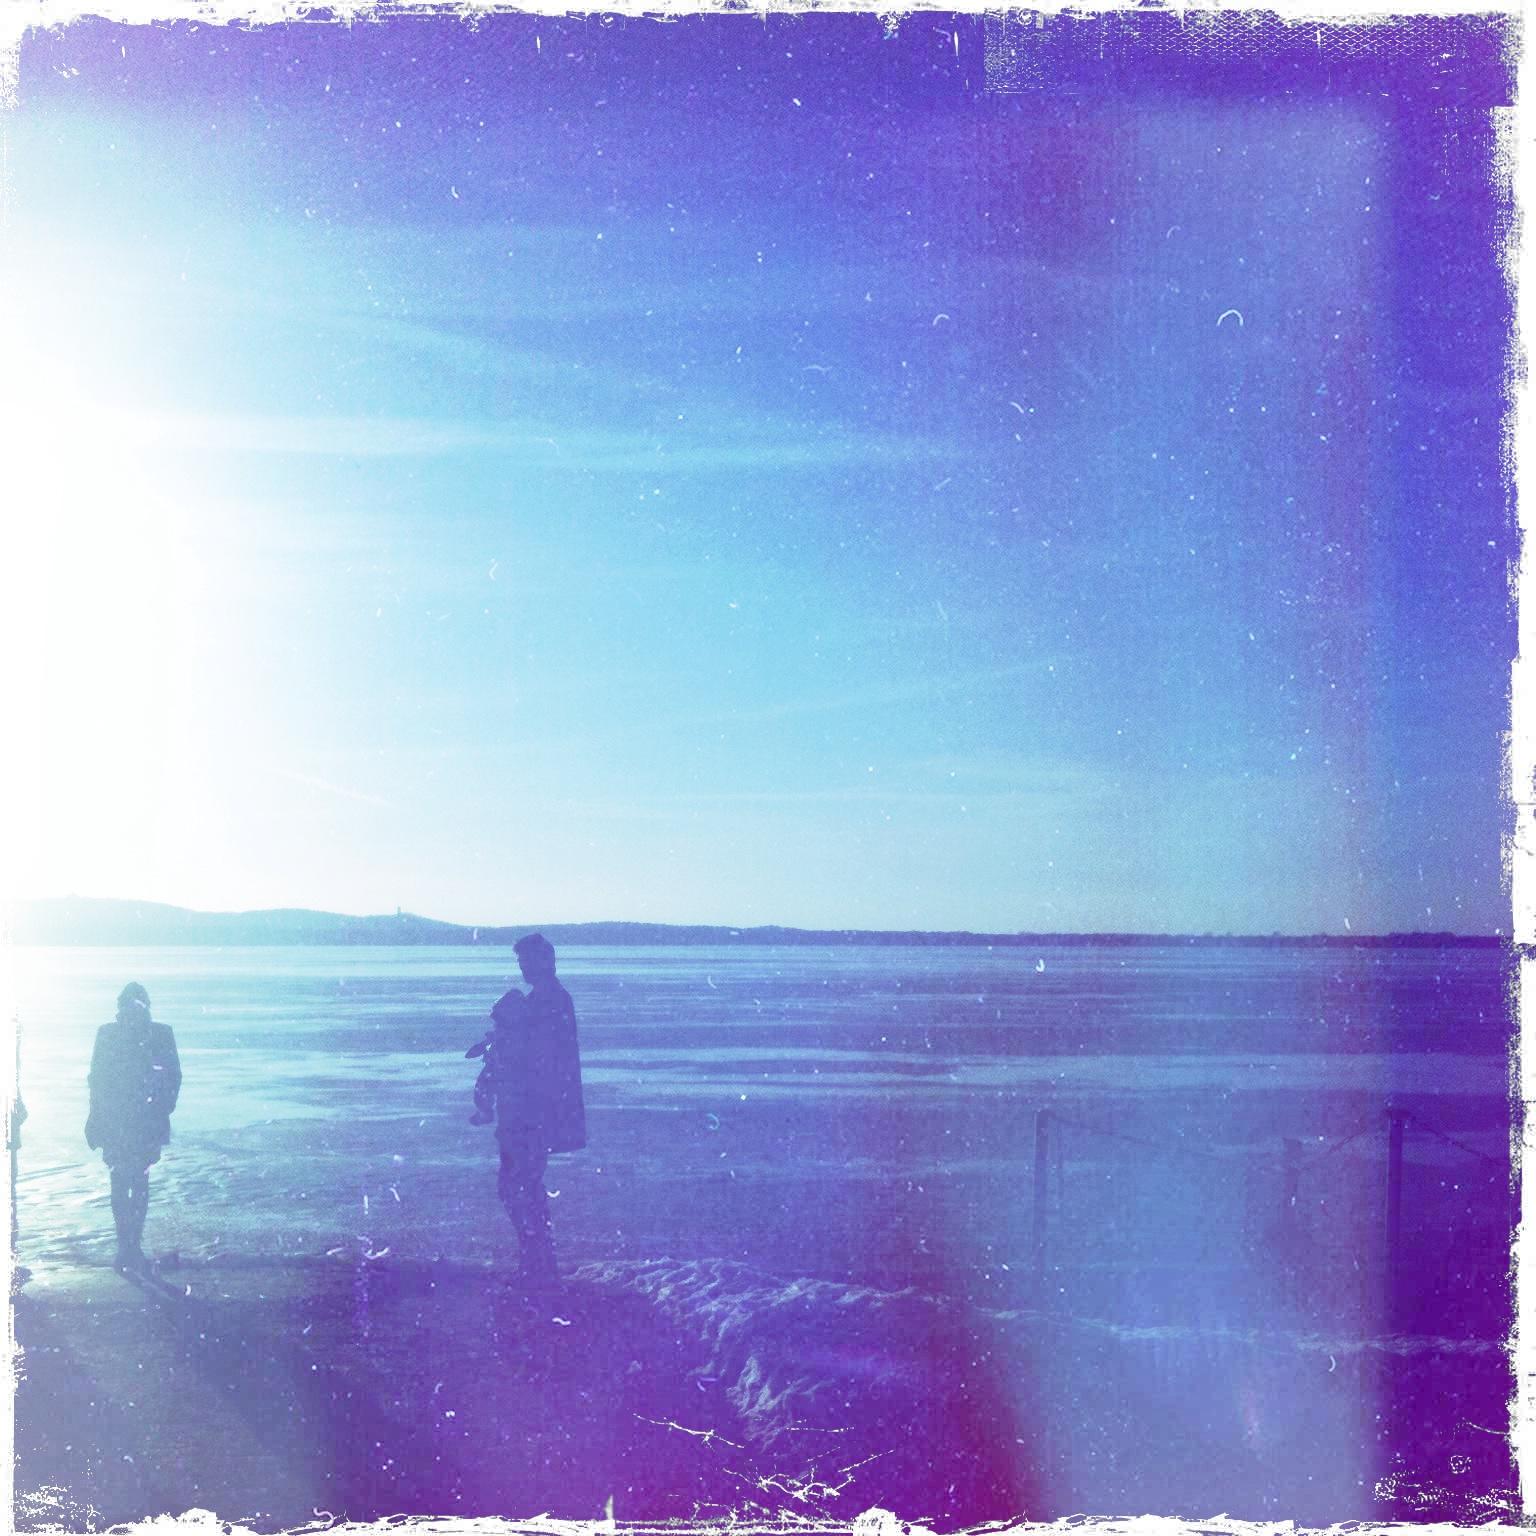 Strandbad-Müggelsee-Eisfläche